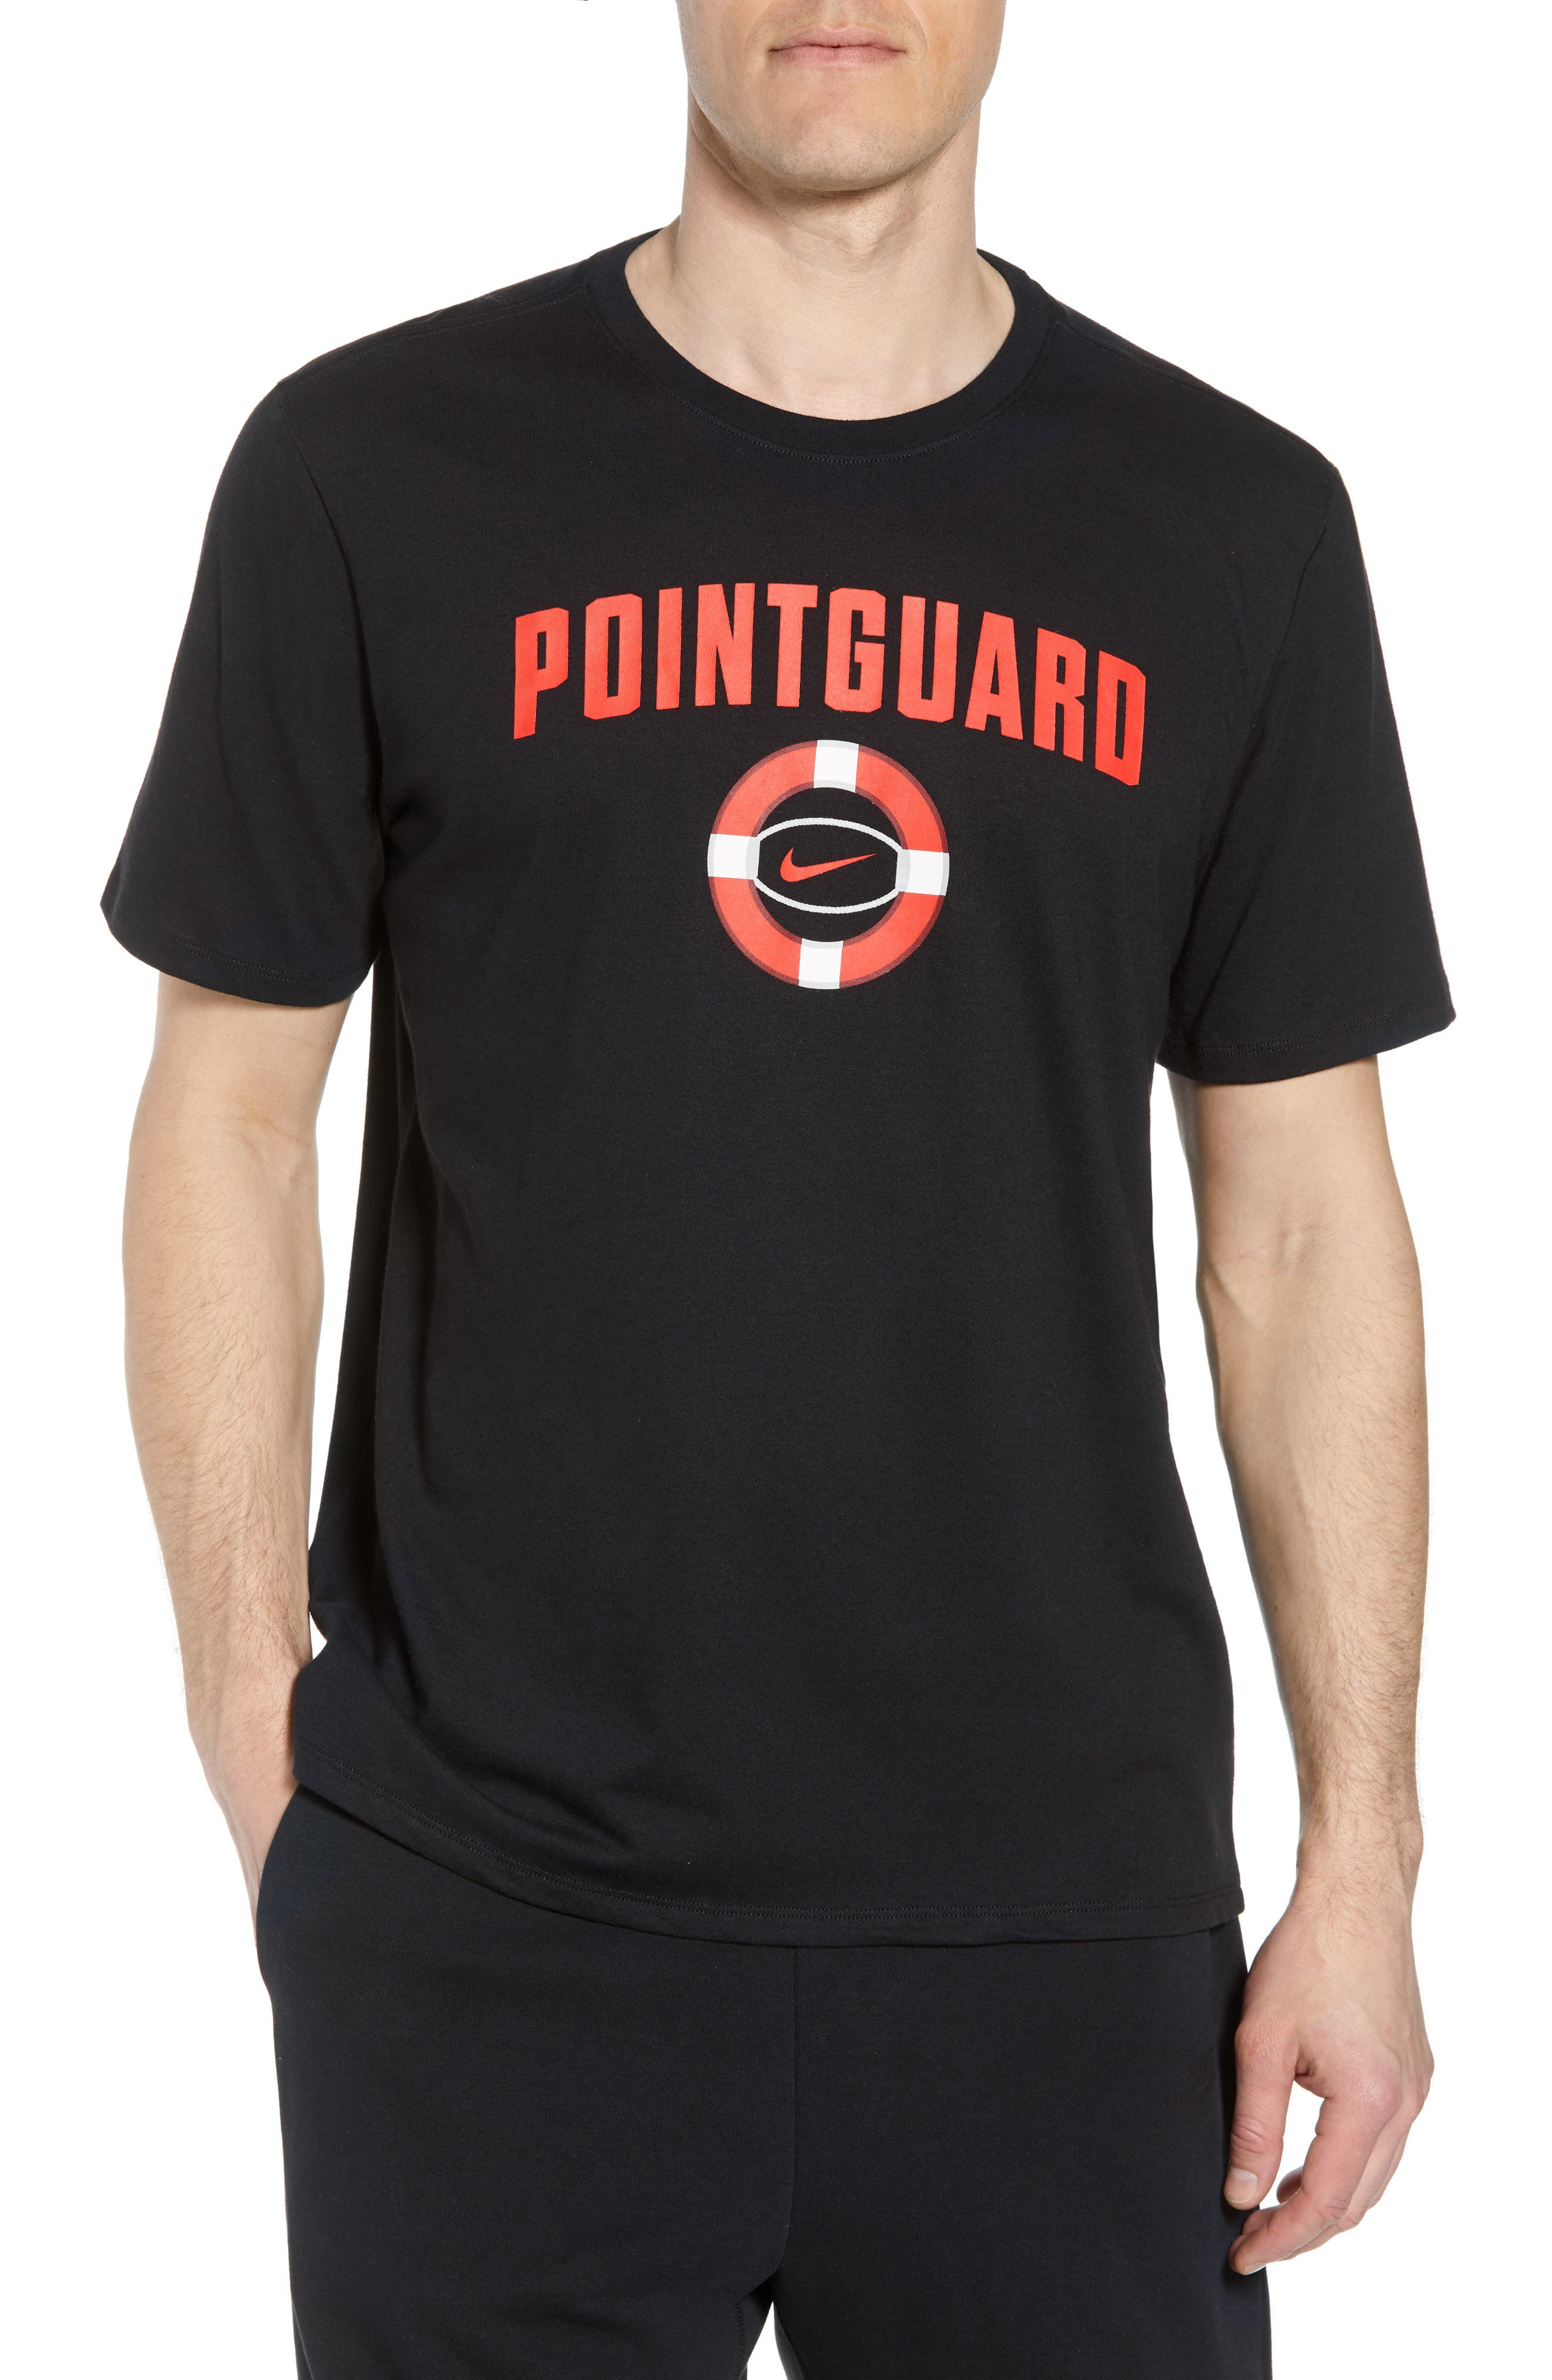 Nike Dry Pointguard Graphic T-Shirt, Black